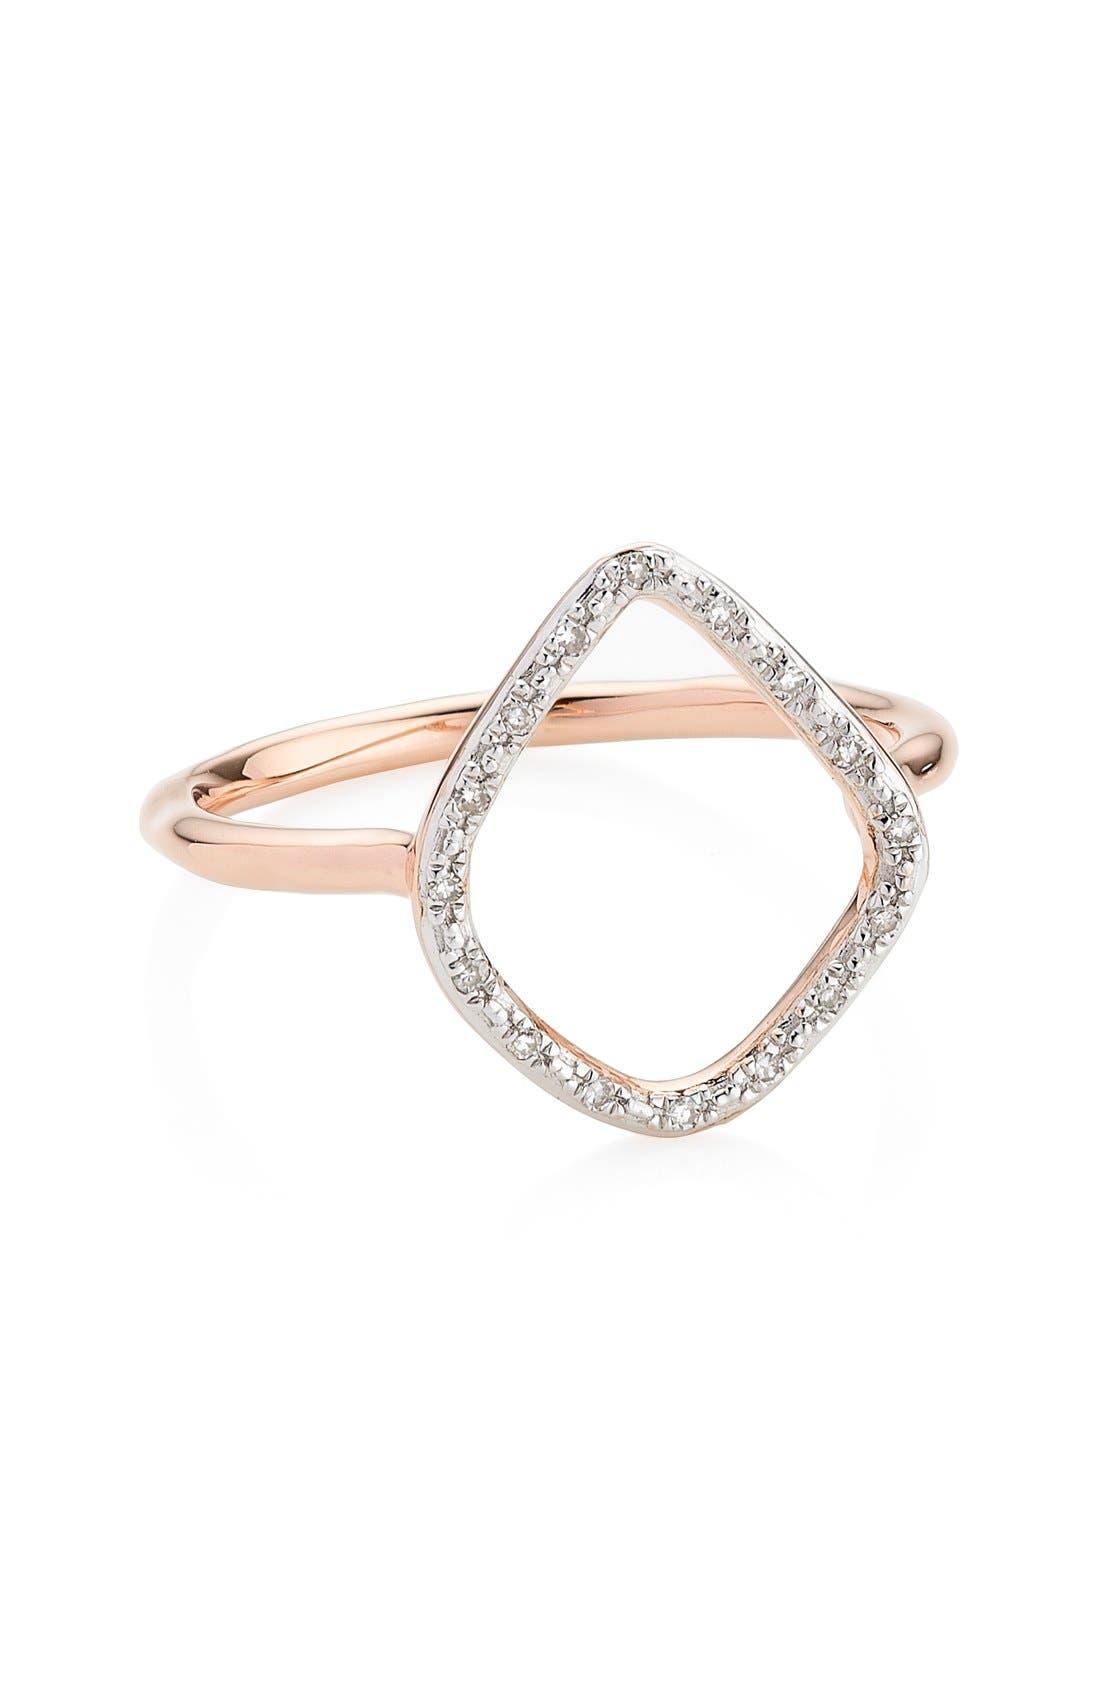 'Riva' Diamond Hoop Ring,                             Alternate thumbnail 7, color,                             ROSE GOLD